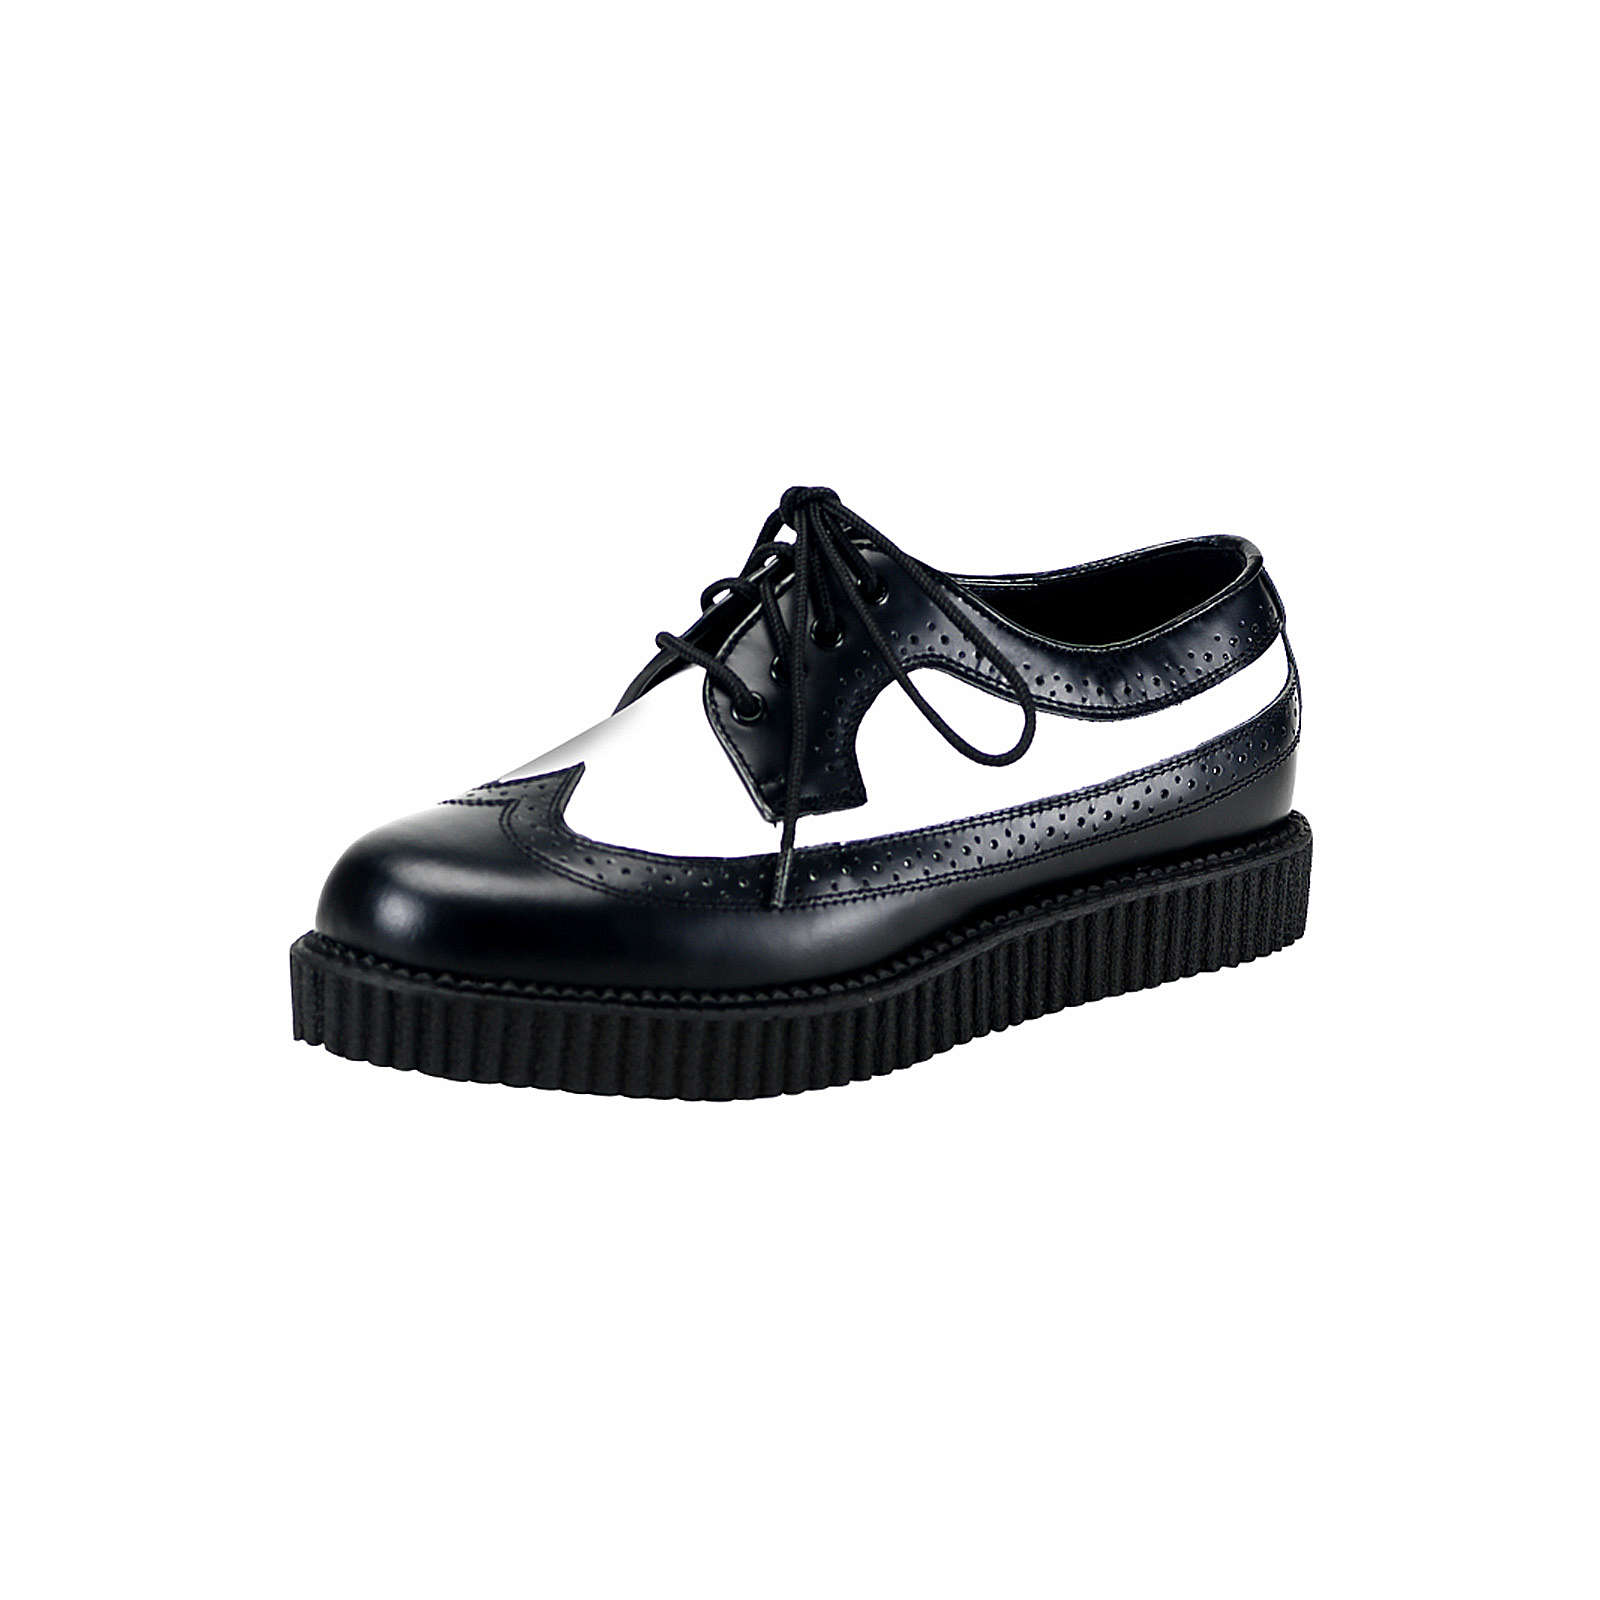 Schnürer Creeper Schnürschuhe schwarz Modell 2 Damen Gr. 41